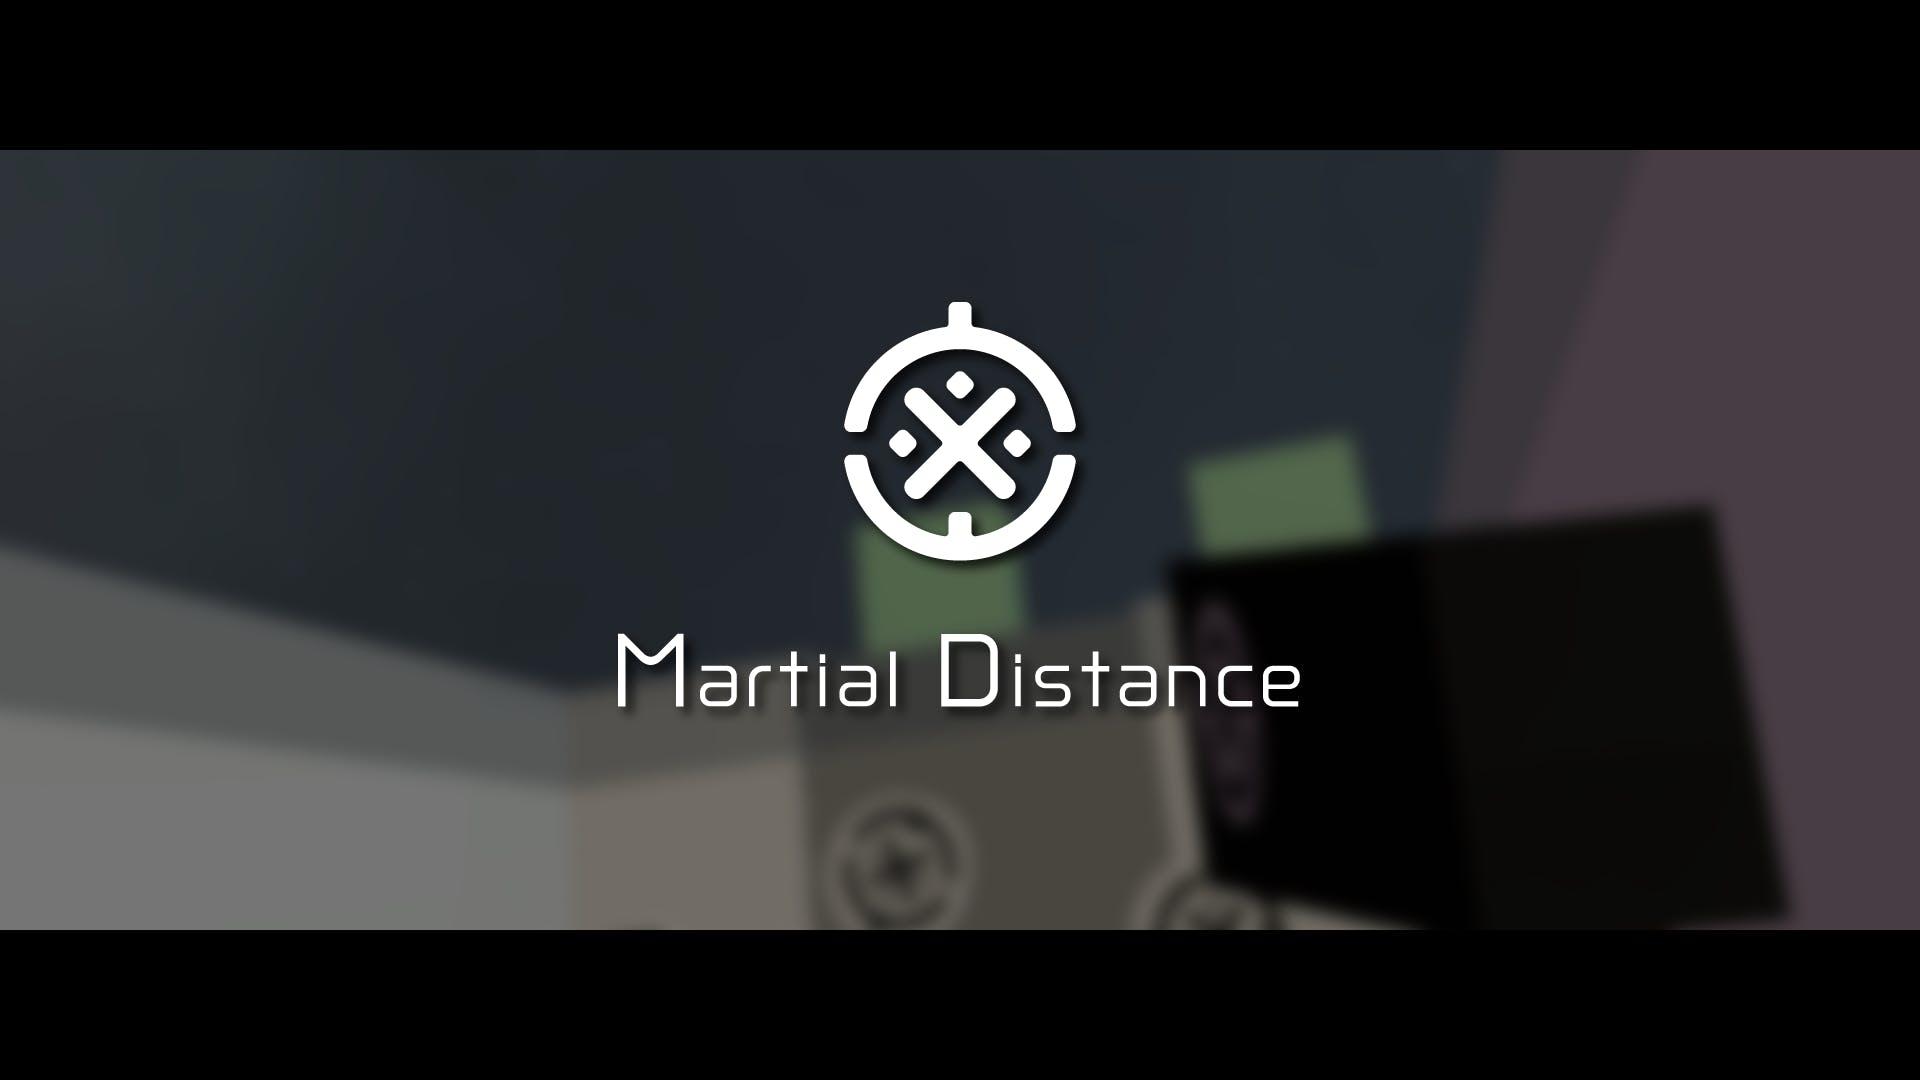 MarshallDistance